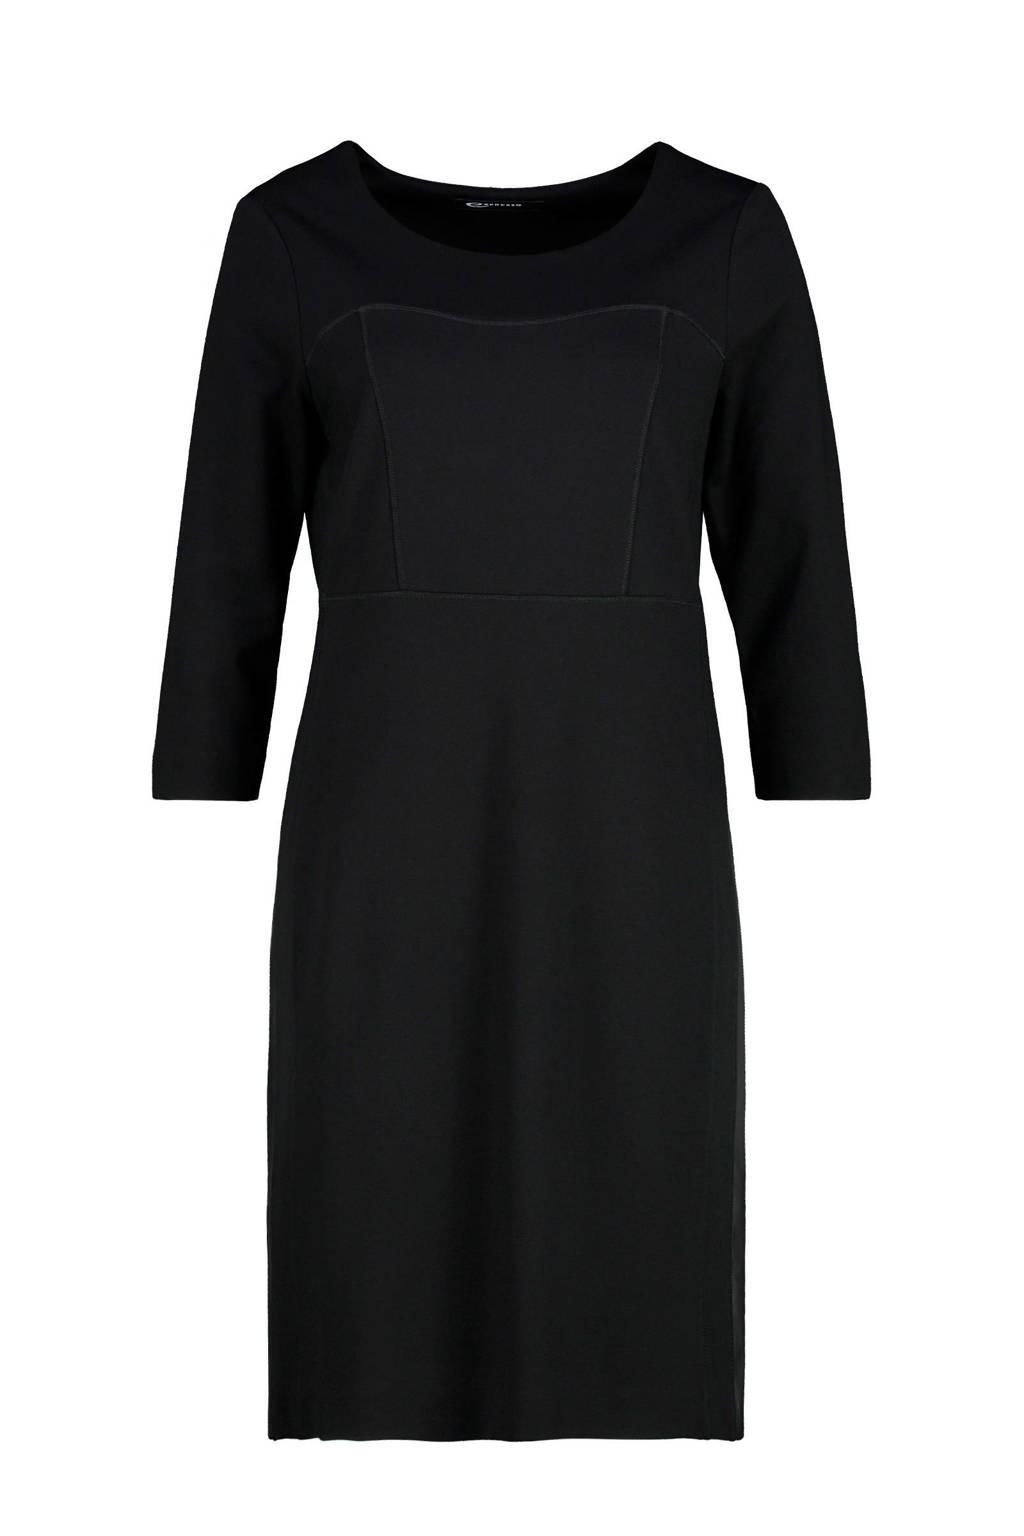 Expresso jurk zwart, Zwart